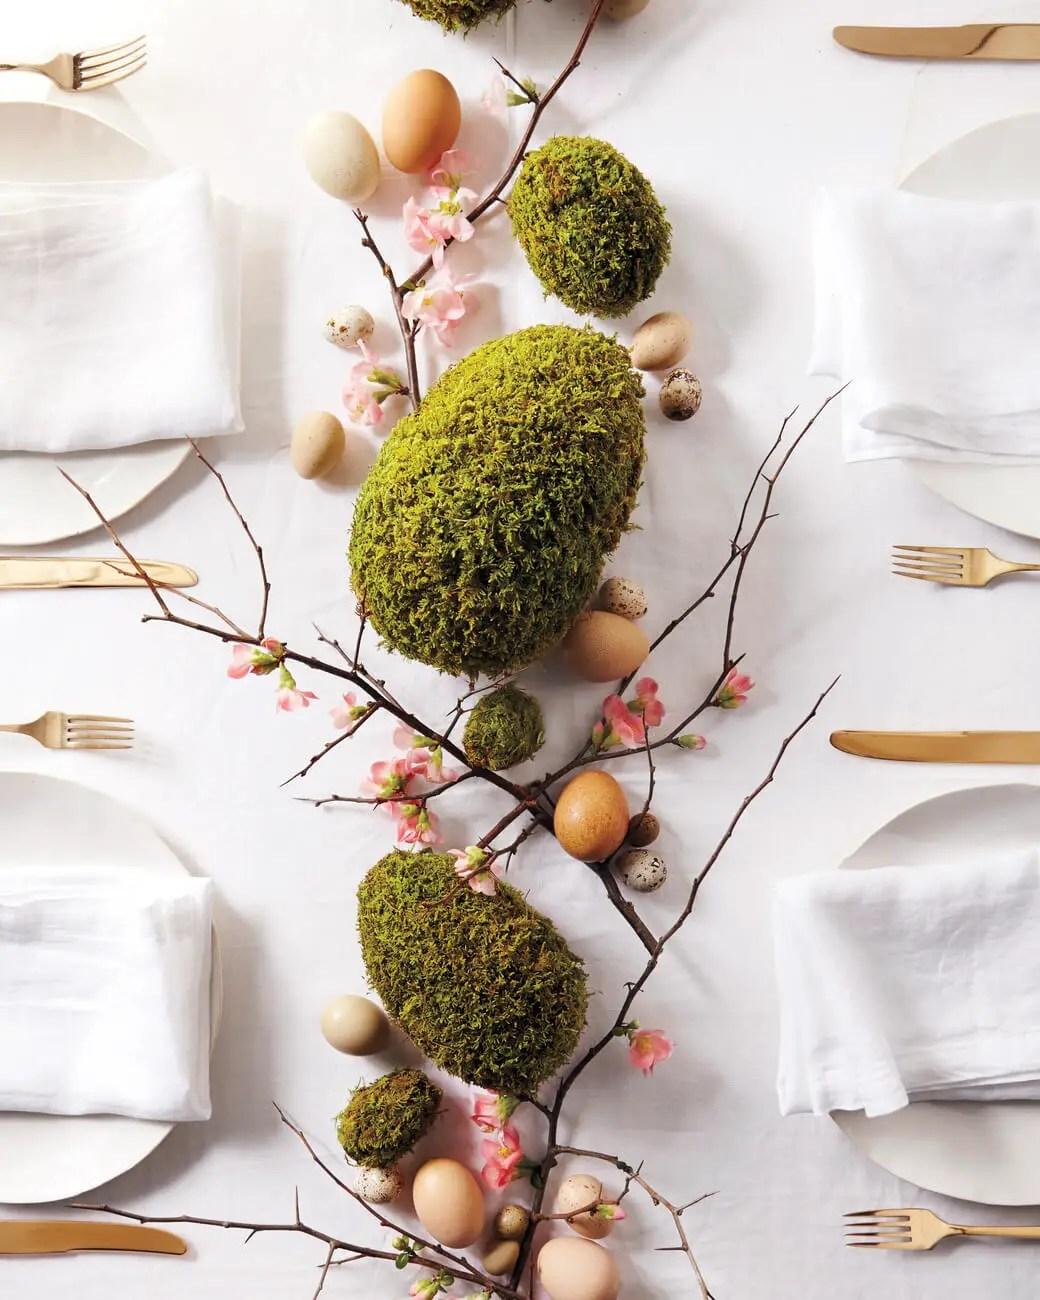 A mossy path egg arrangement